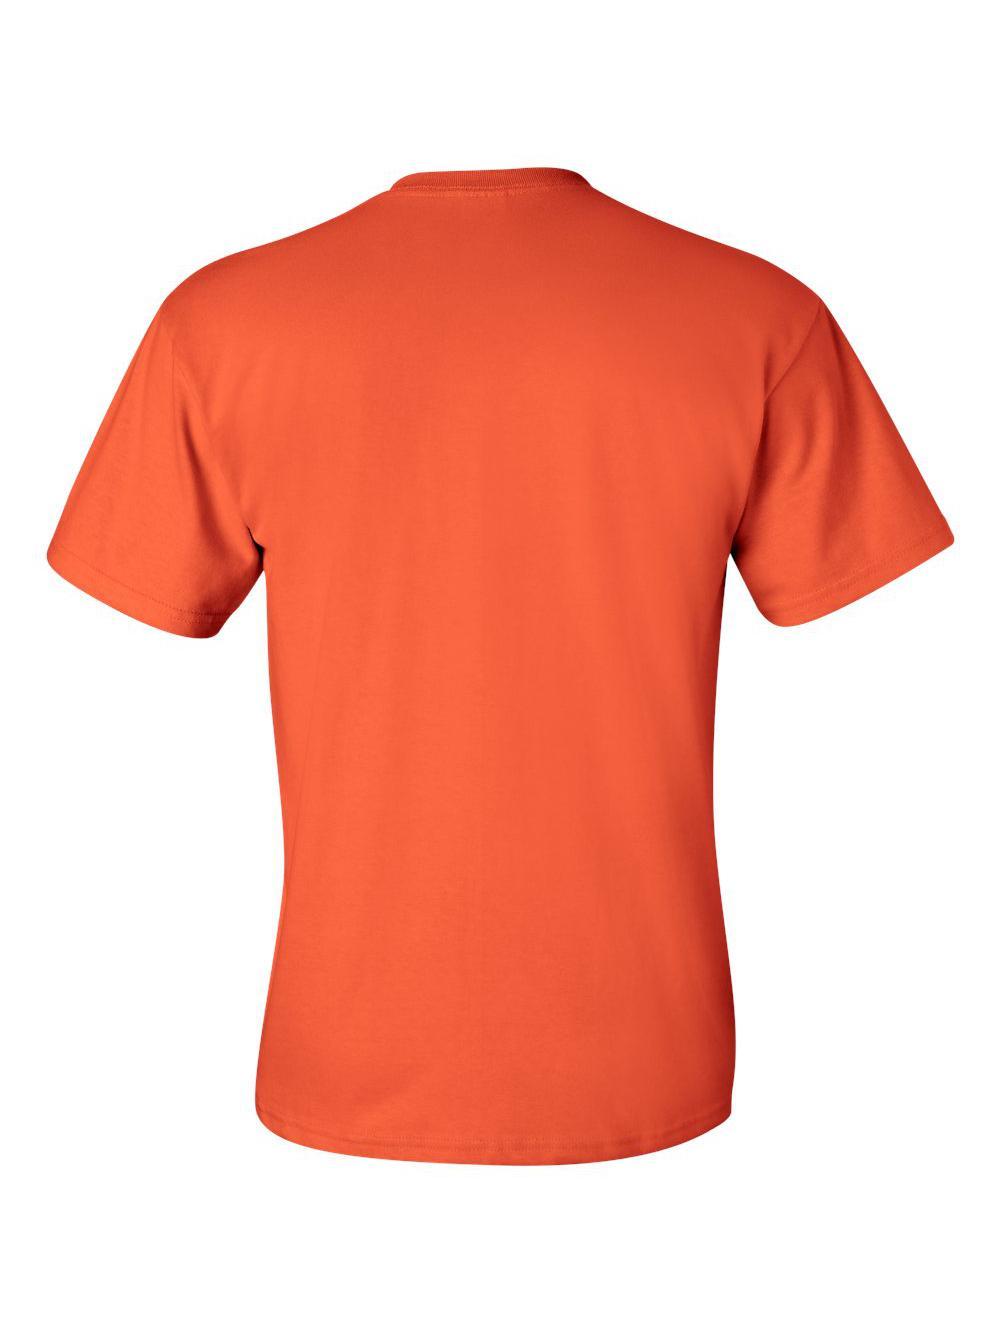 Gildan-Ultra-Cotton-T-Shirt-with-a-Pocket-2300 thumbnail 25